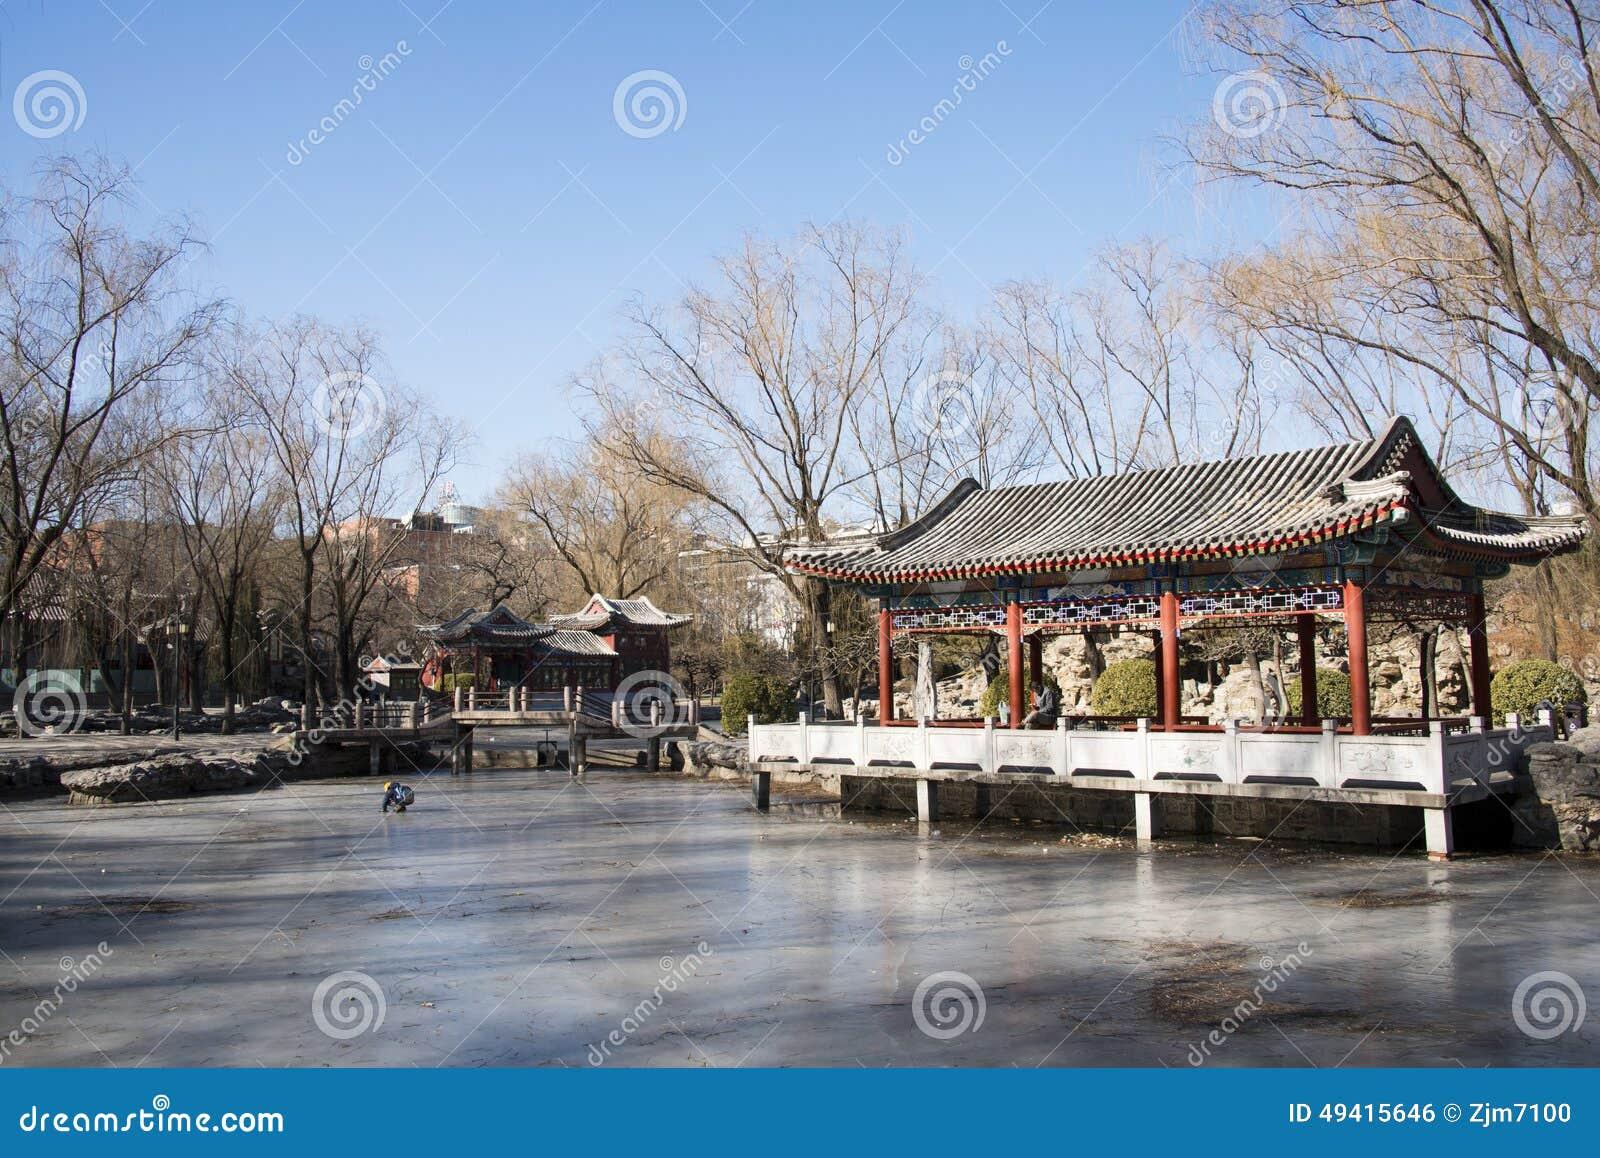 Download Asiat China, Peking, Ritan-Park Redaktionelles Foto - Bild von tourismus, winter: 49415646